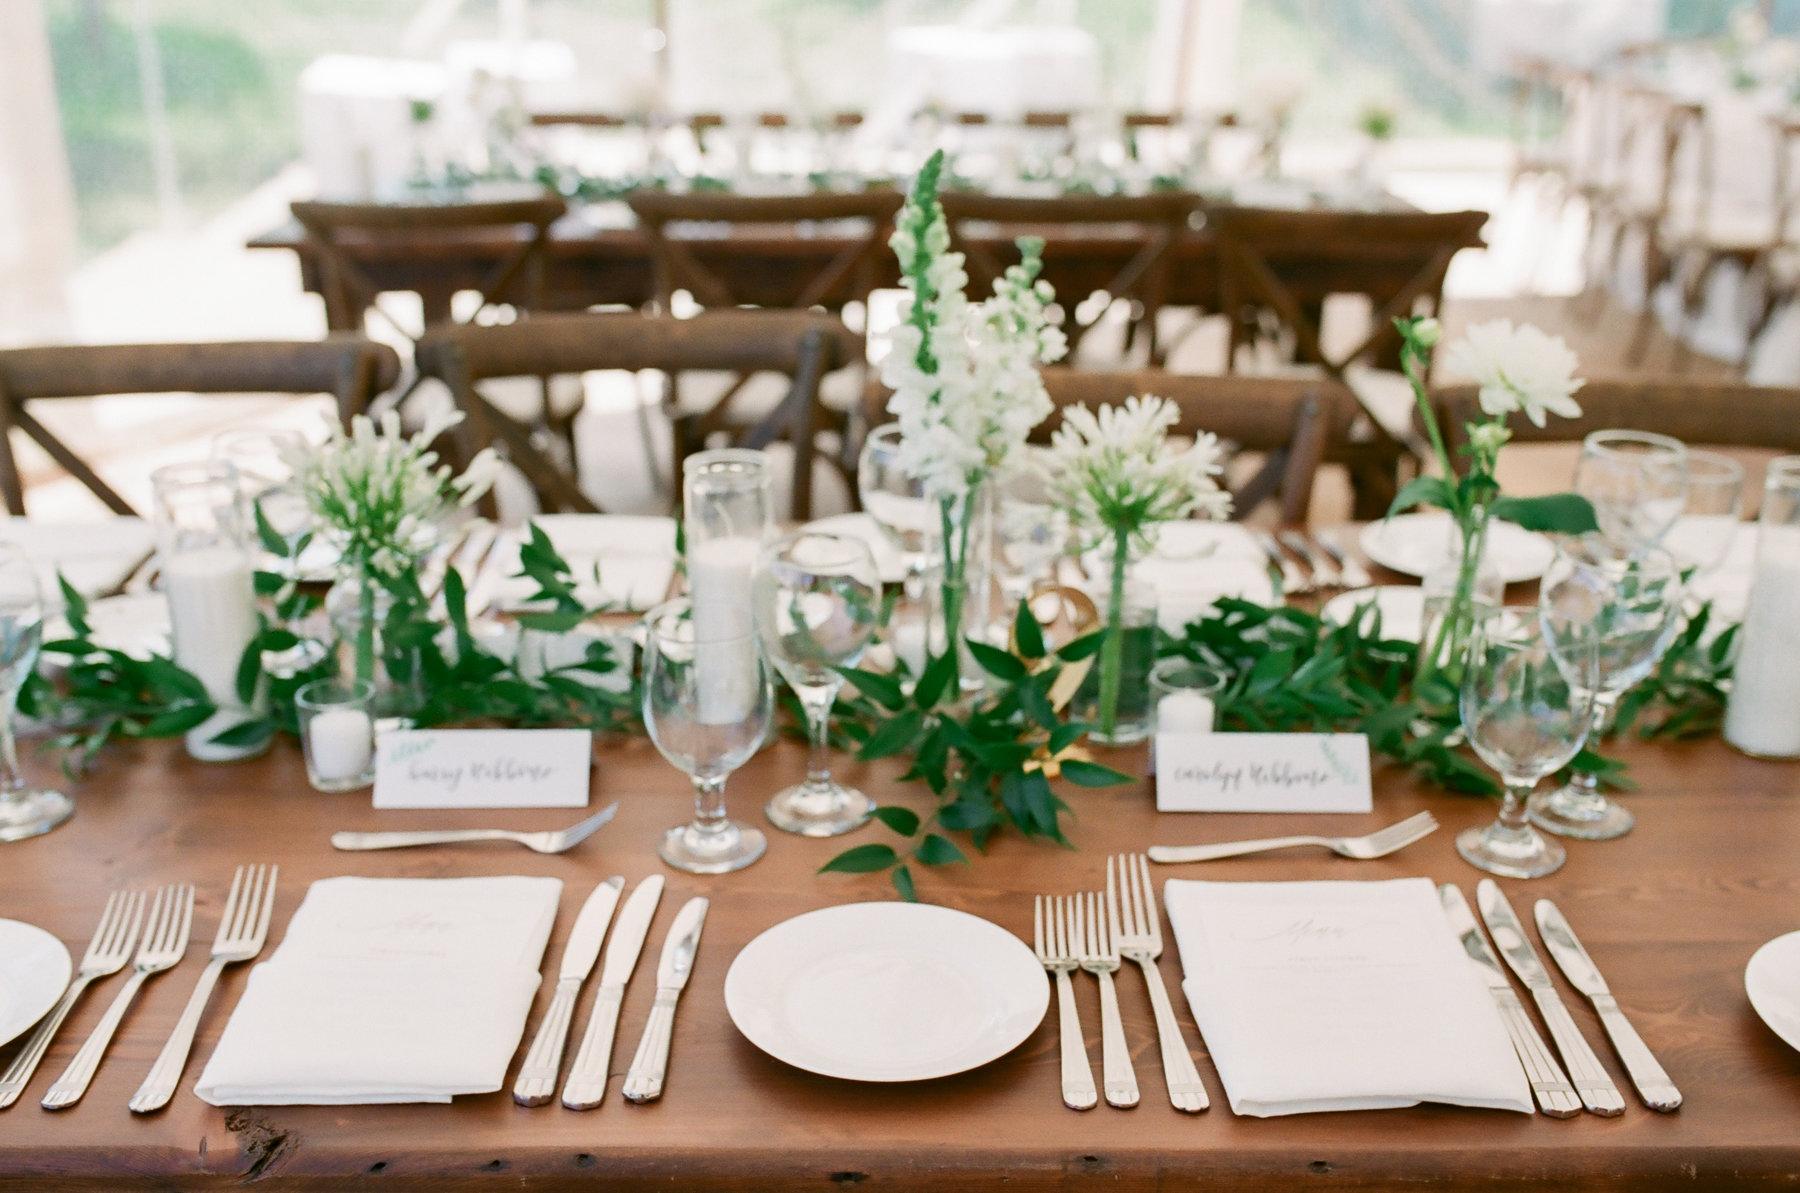 0770-maggiebrett-private-estate-wedding-000006310034.jpg